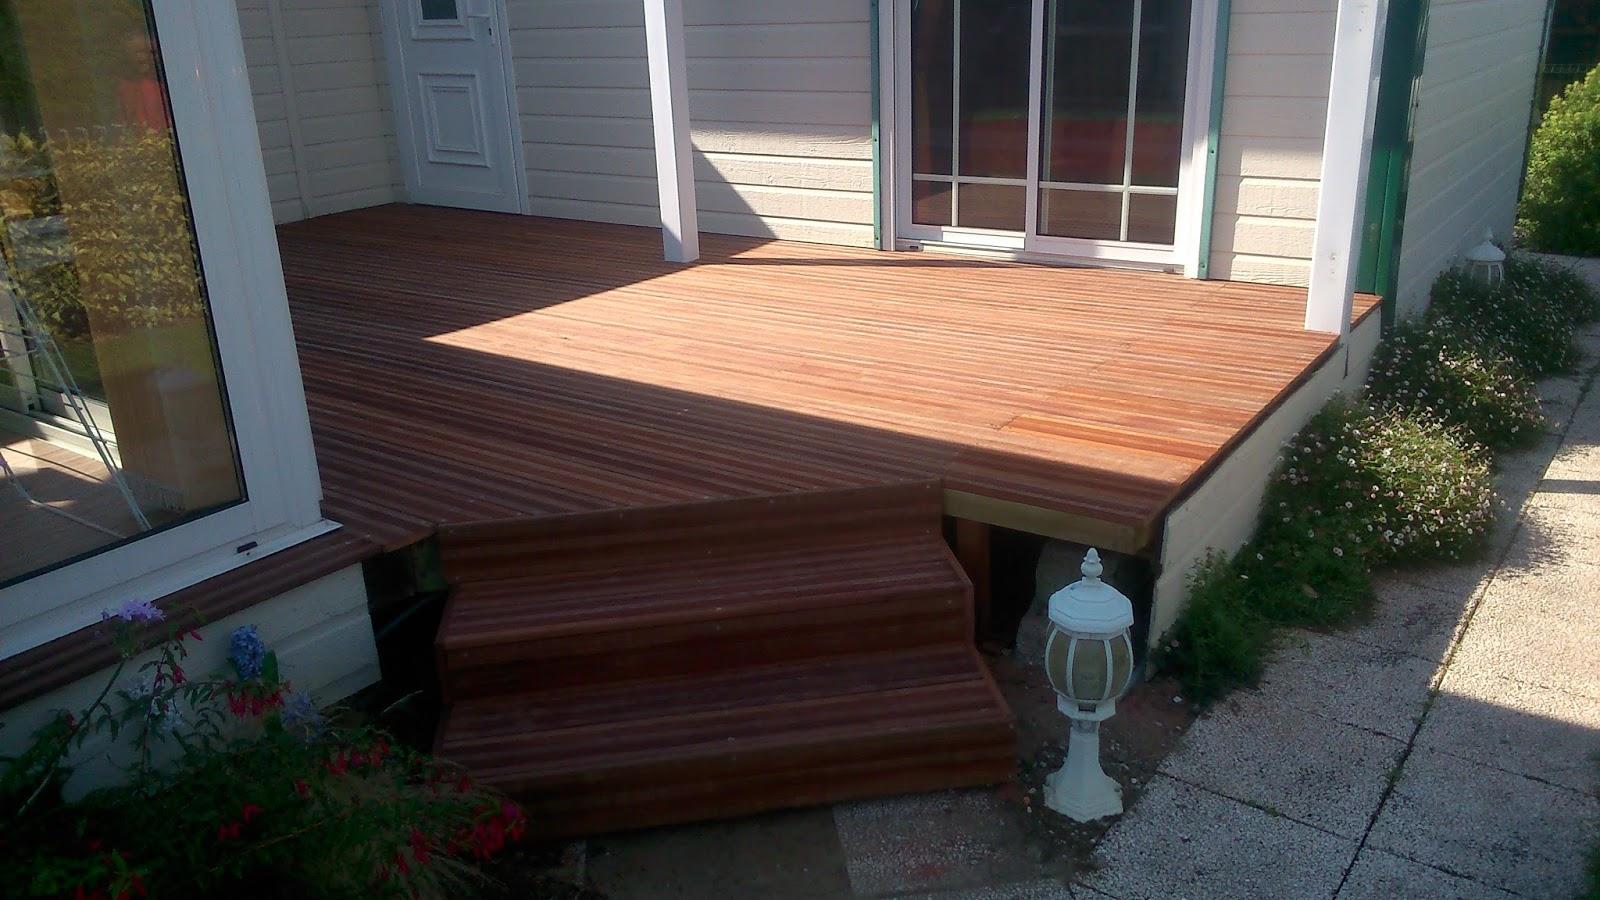 jrenovabita terrasse exotique. Black Bedroom Furniture Sets. Home Design Ideas